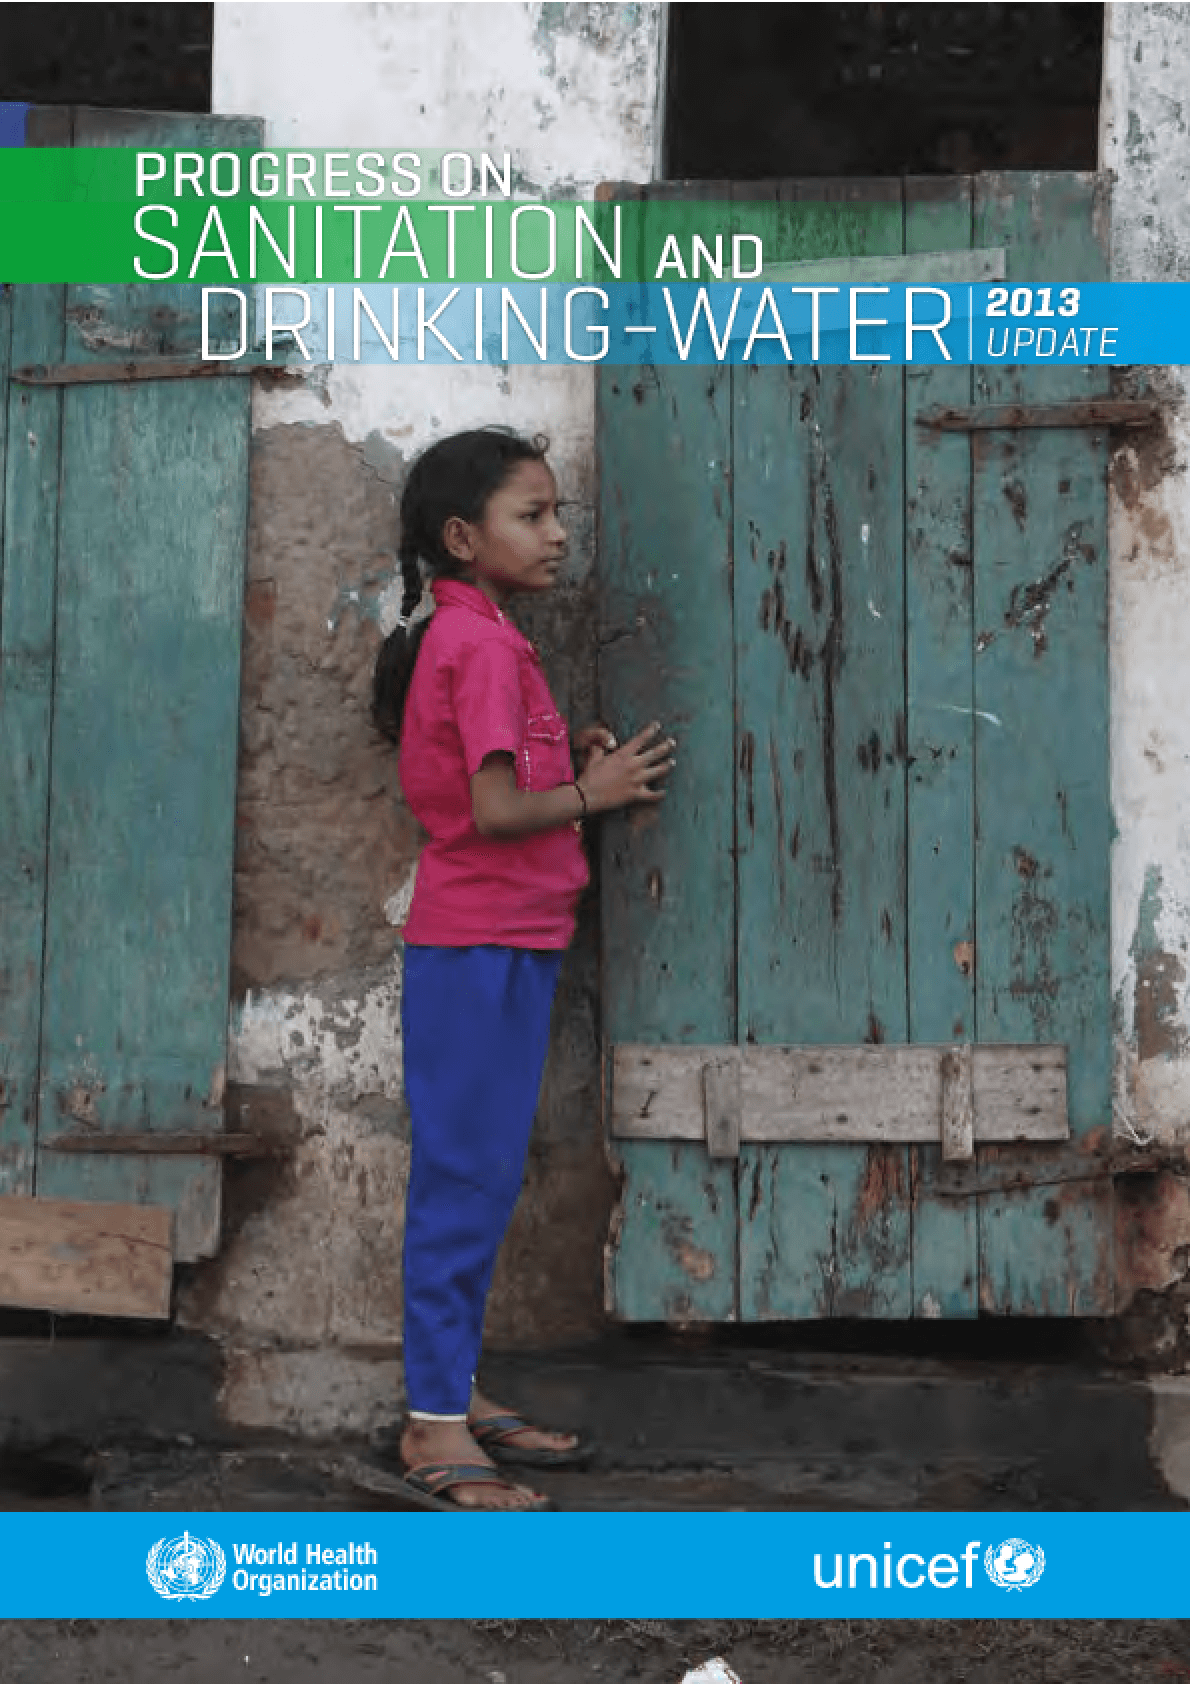 Progress on Sanitation and Drinking-Water: 2013 Update